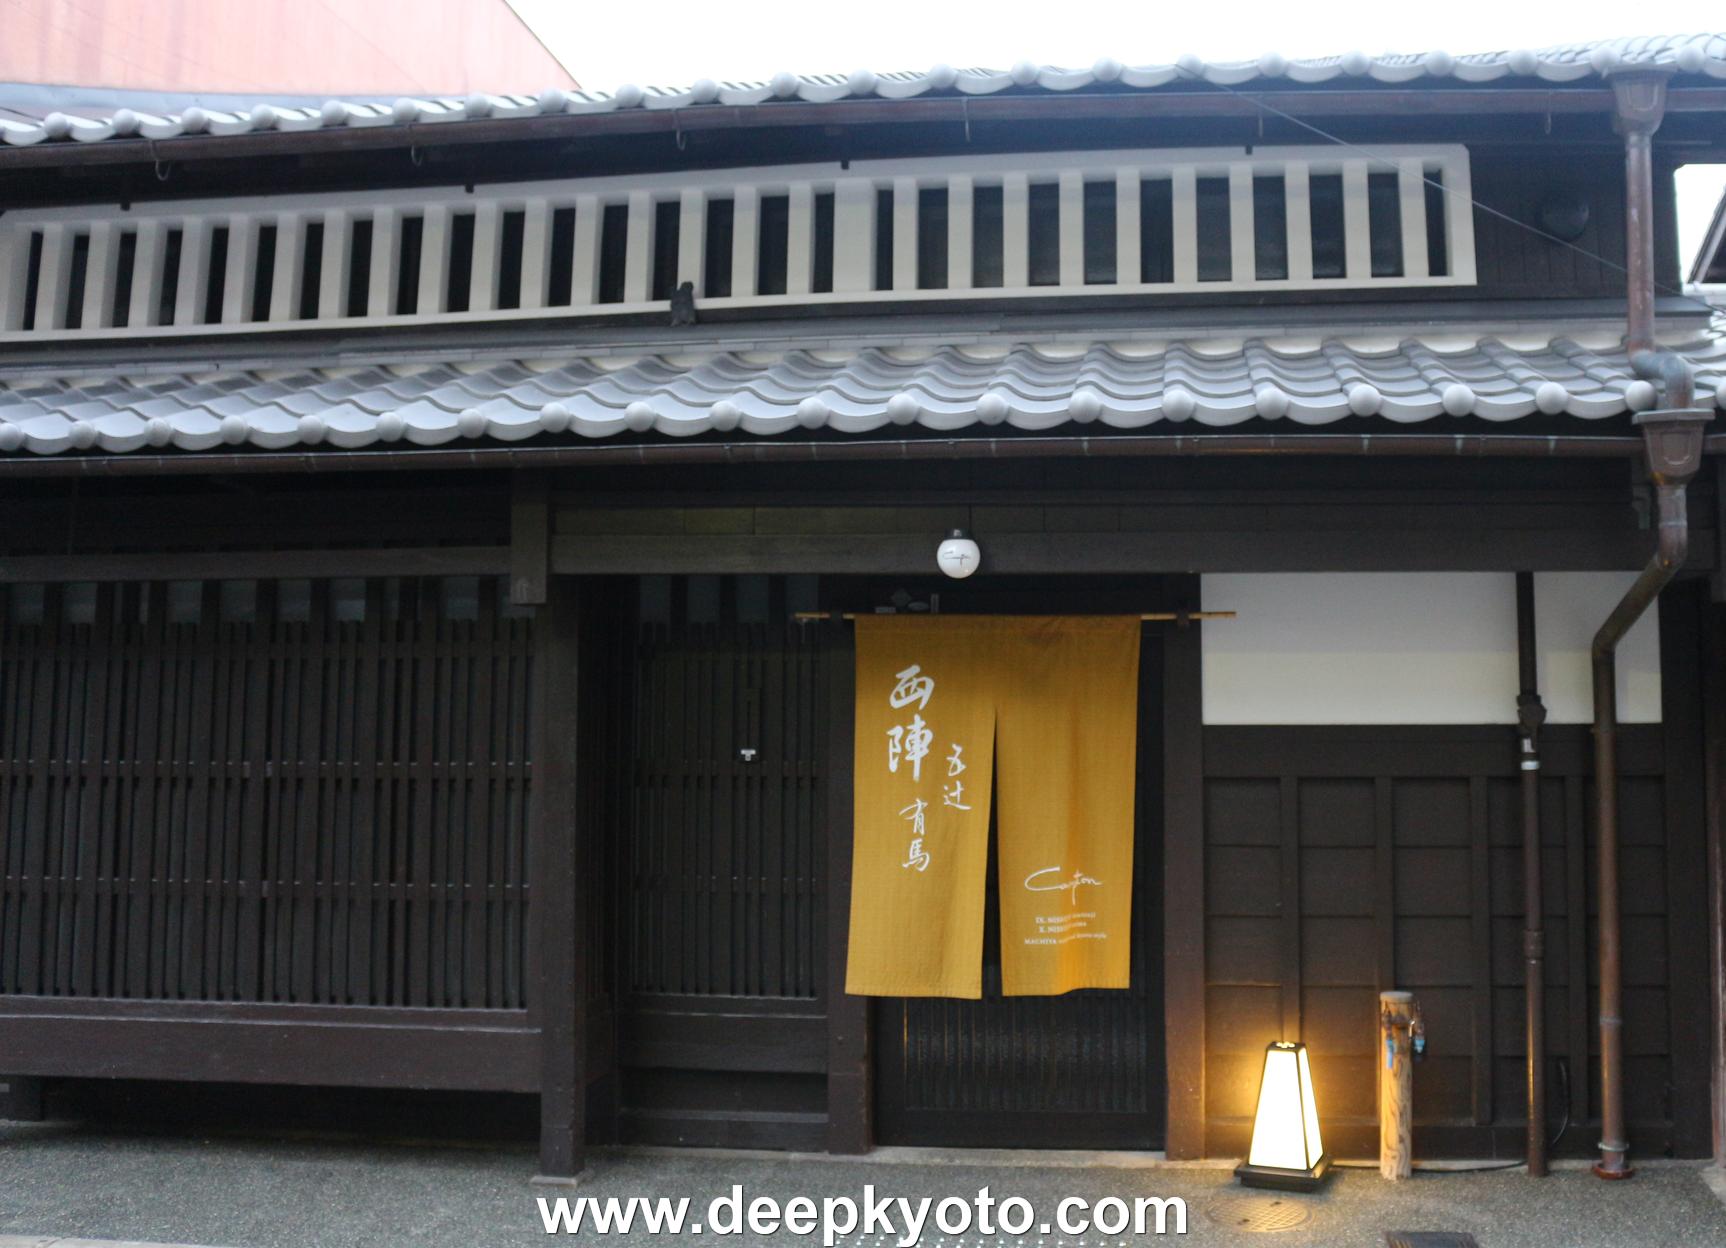 Campton Luxury Lodges  The Future Of Kyomachiya  U2013 Deep Kyoto